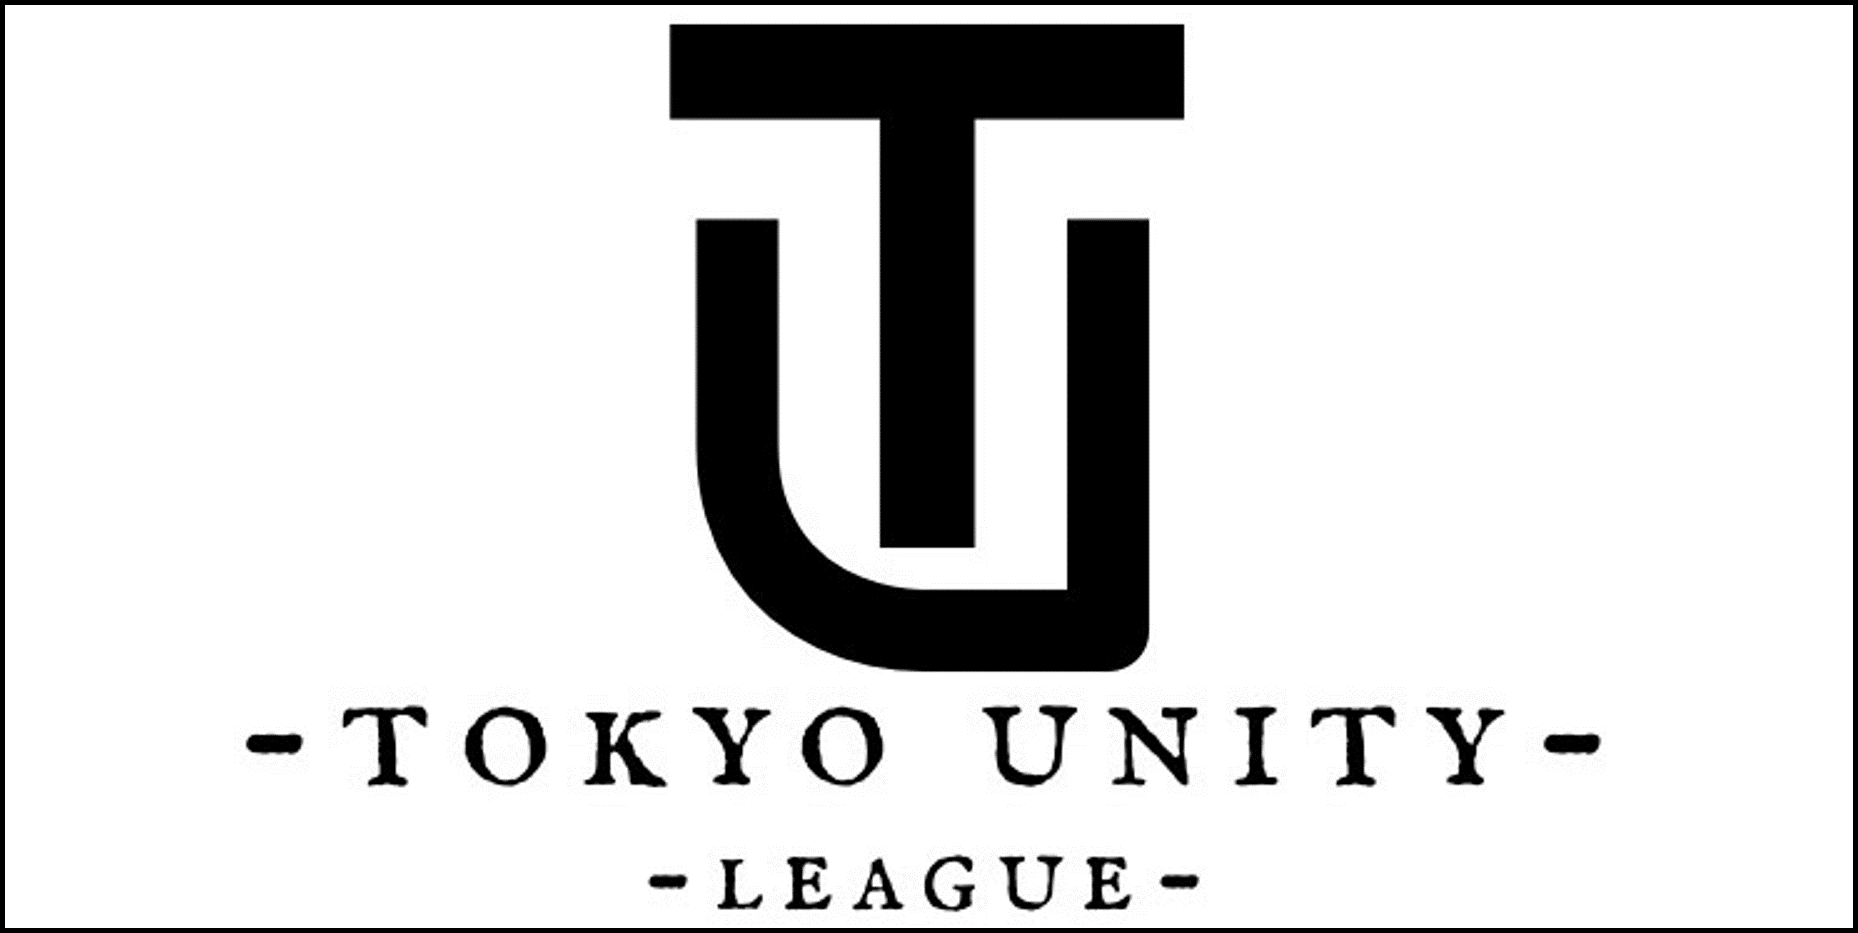 TOKYO UNITY LEAGUE